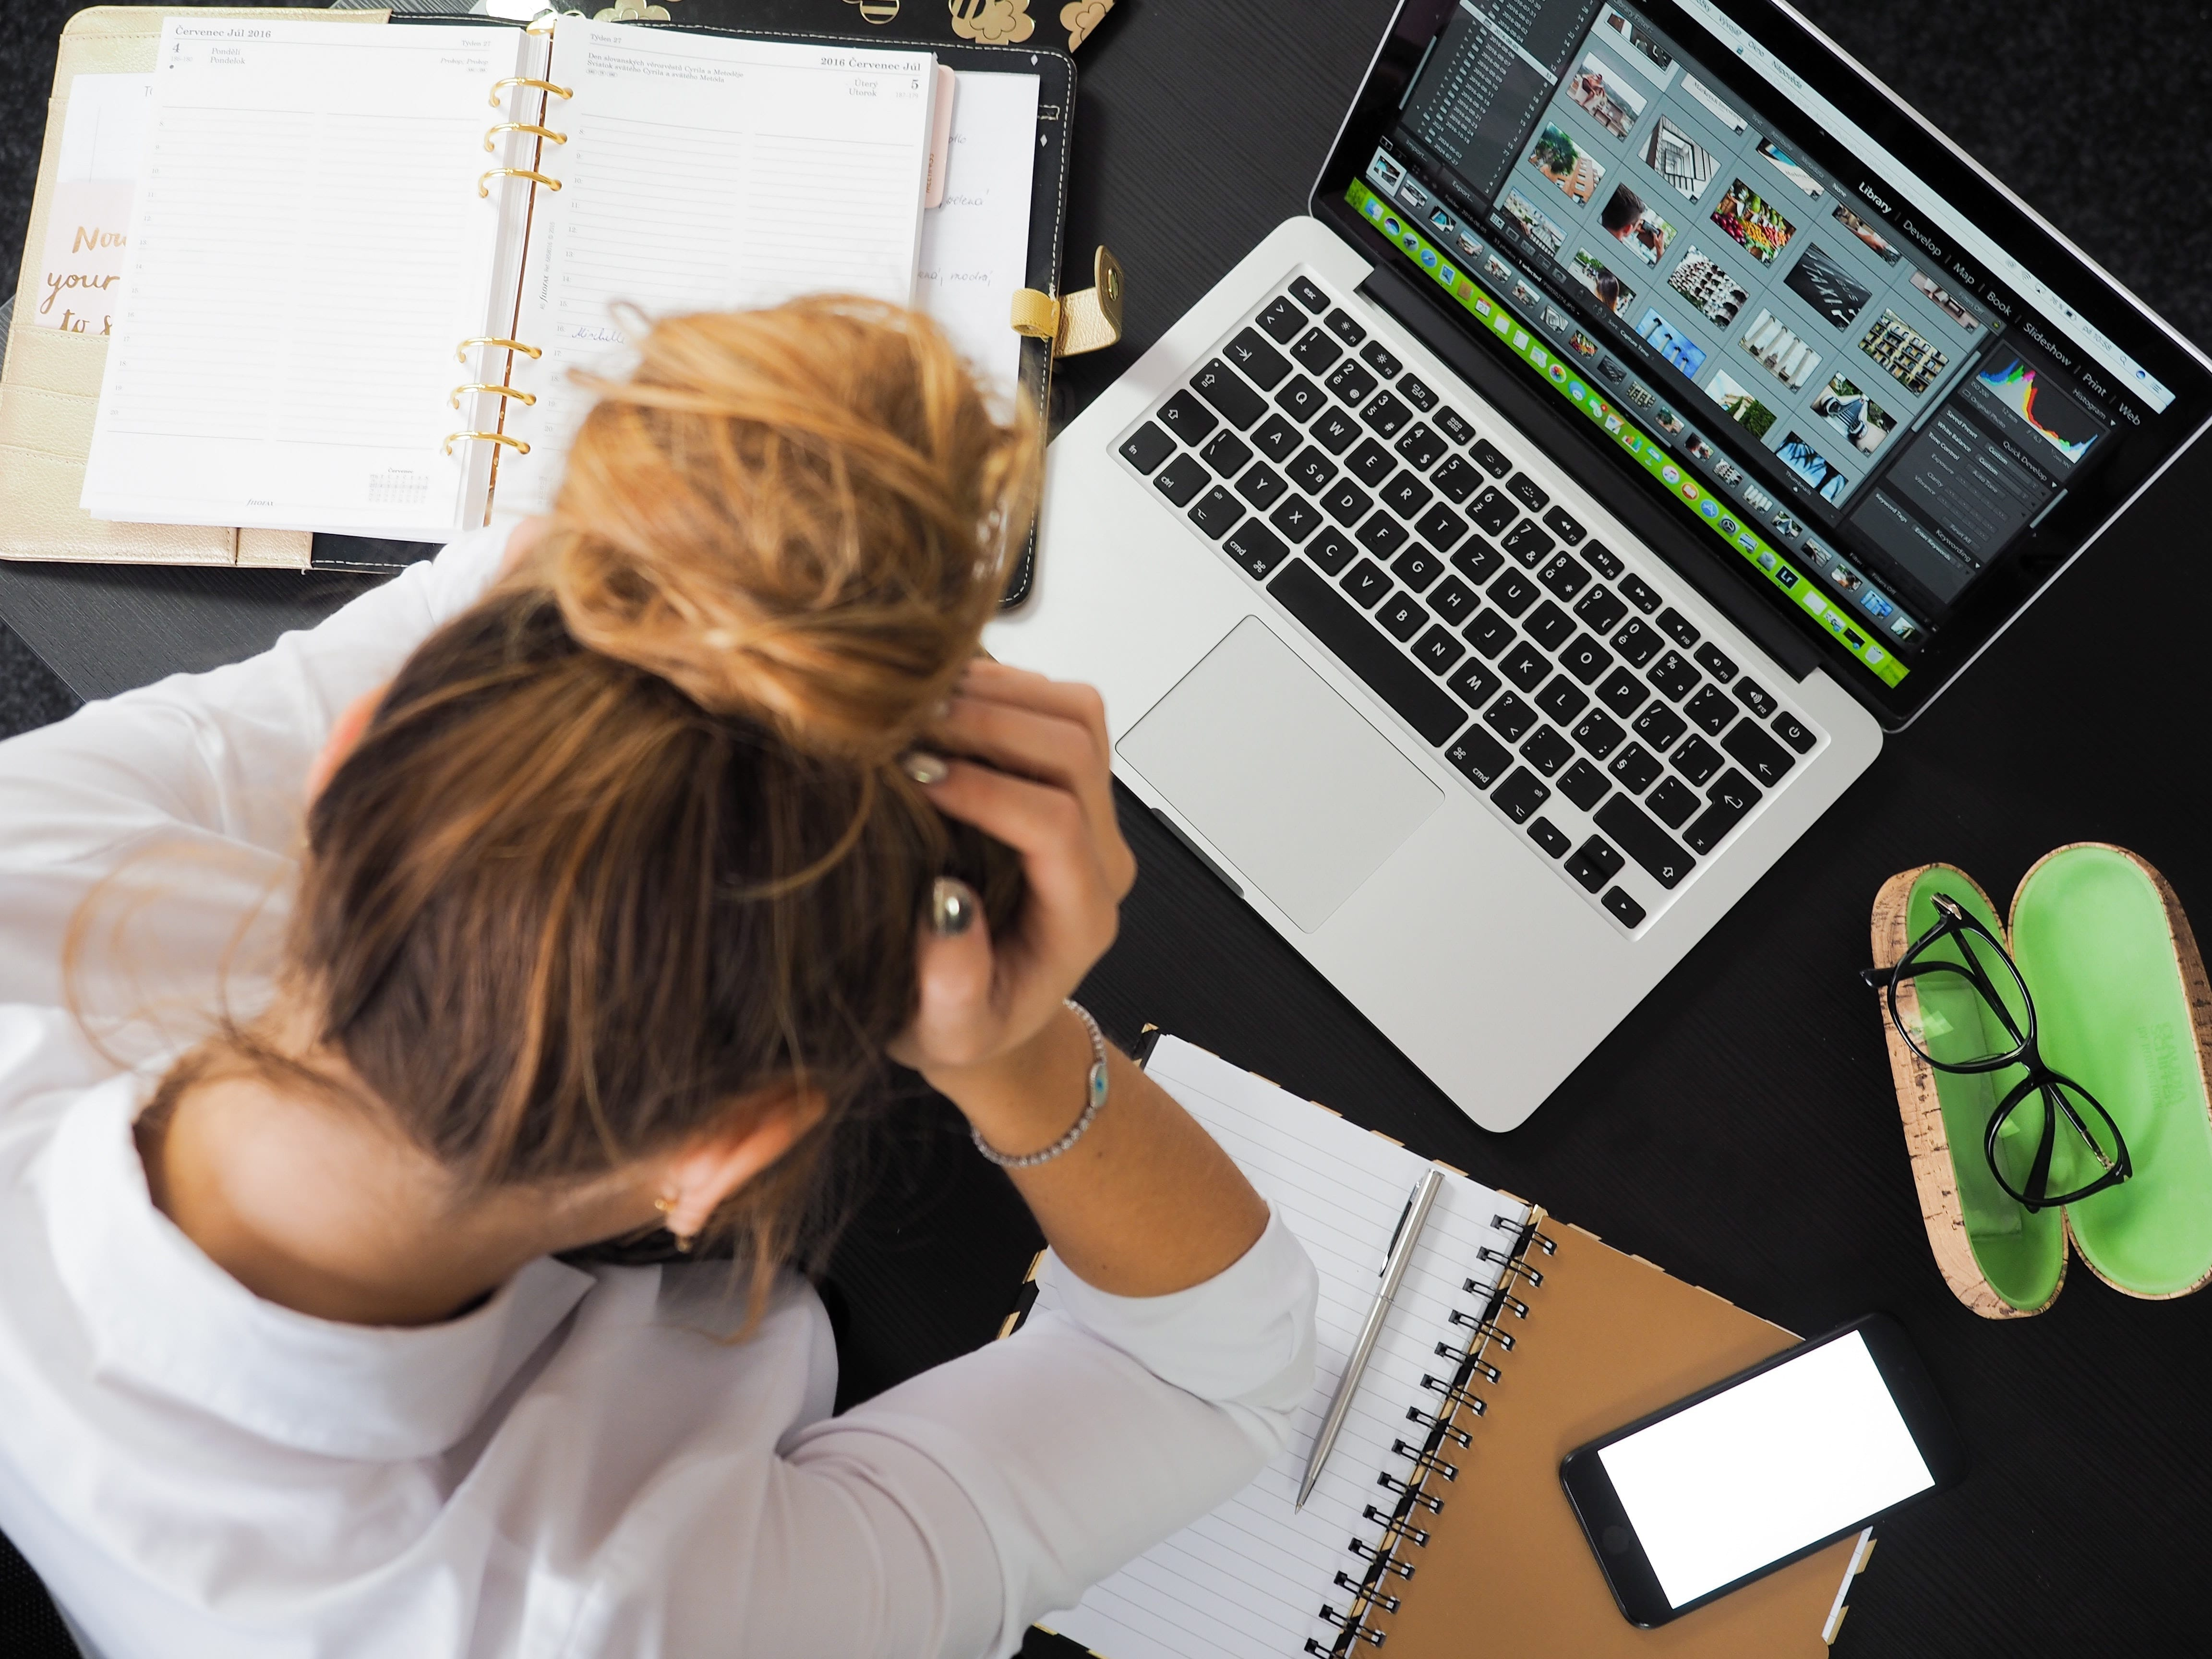 stressed-worker-at-work-desk